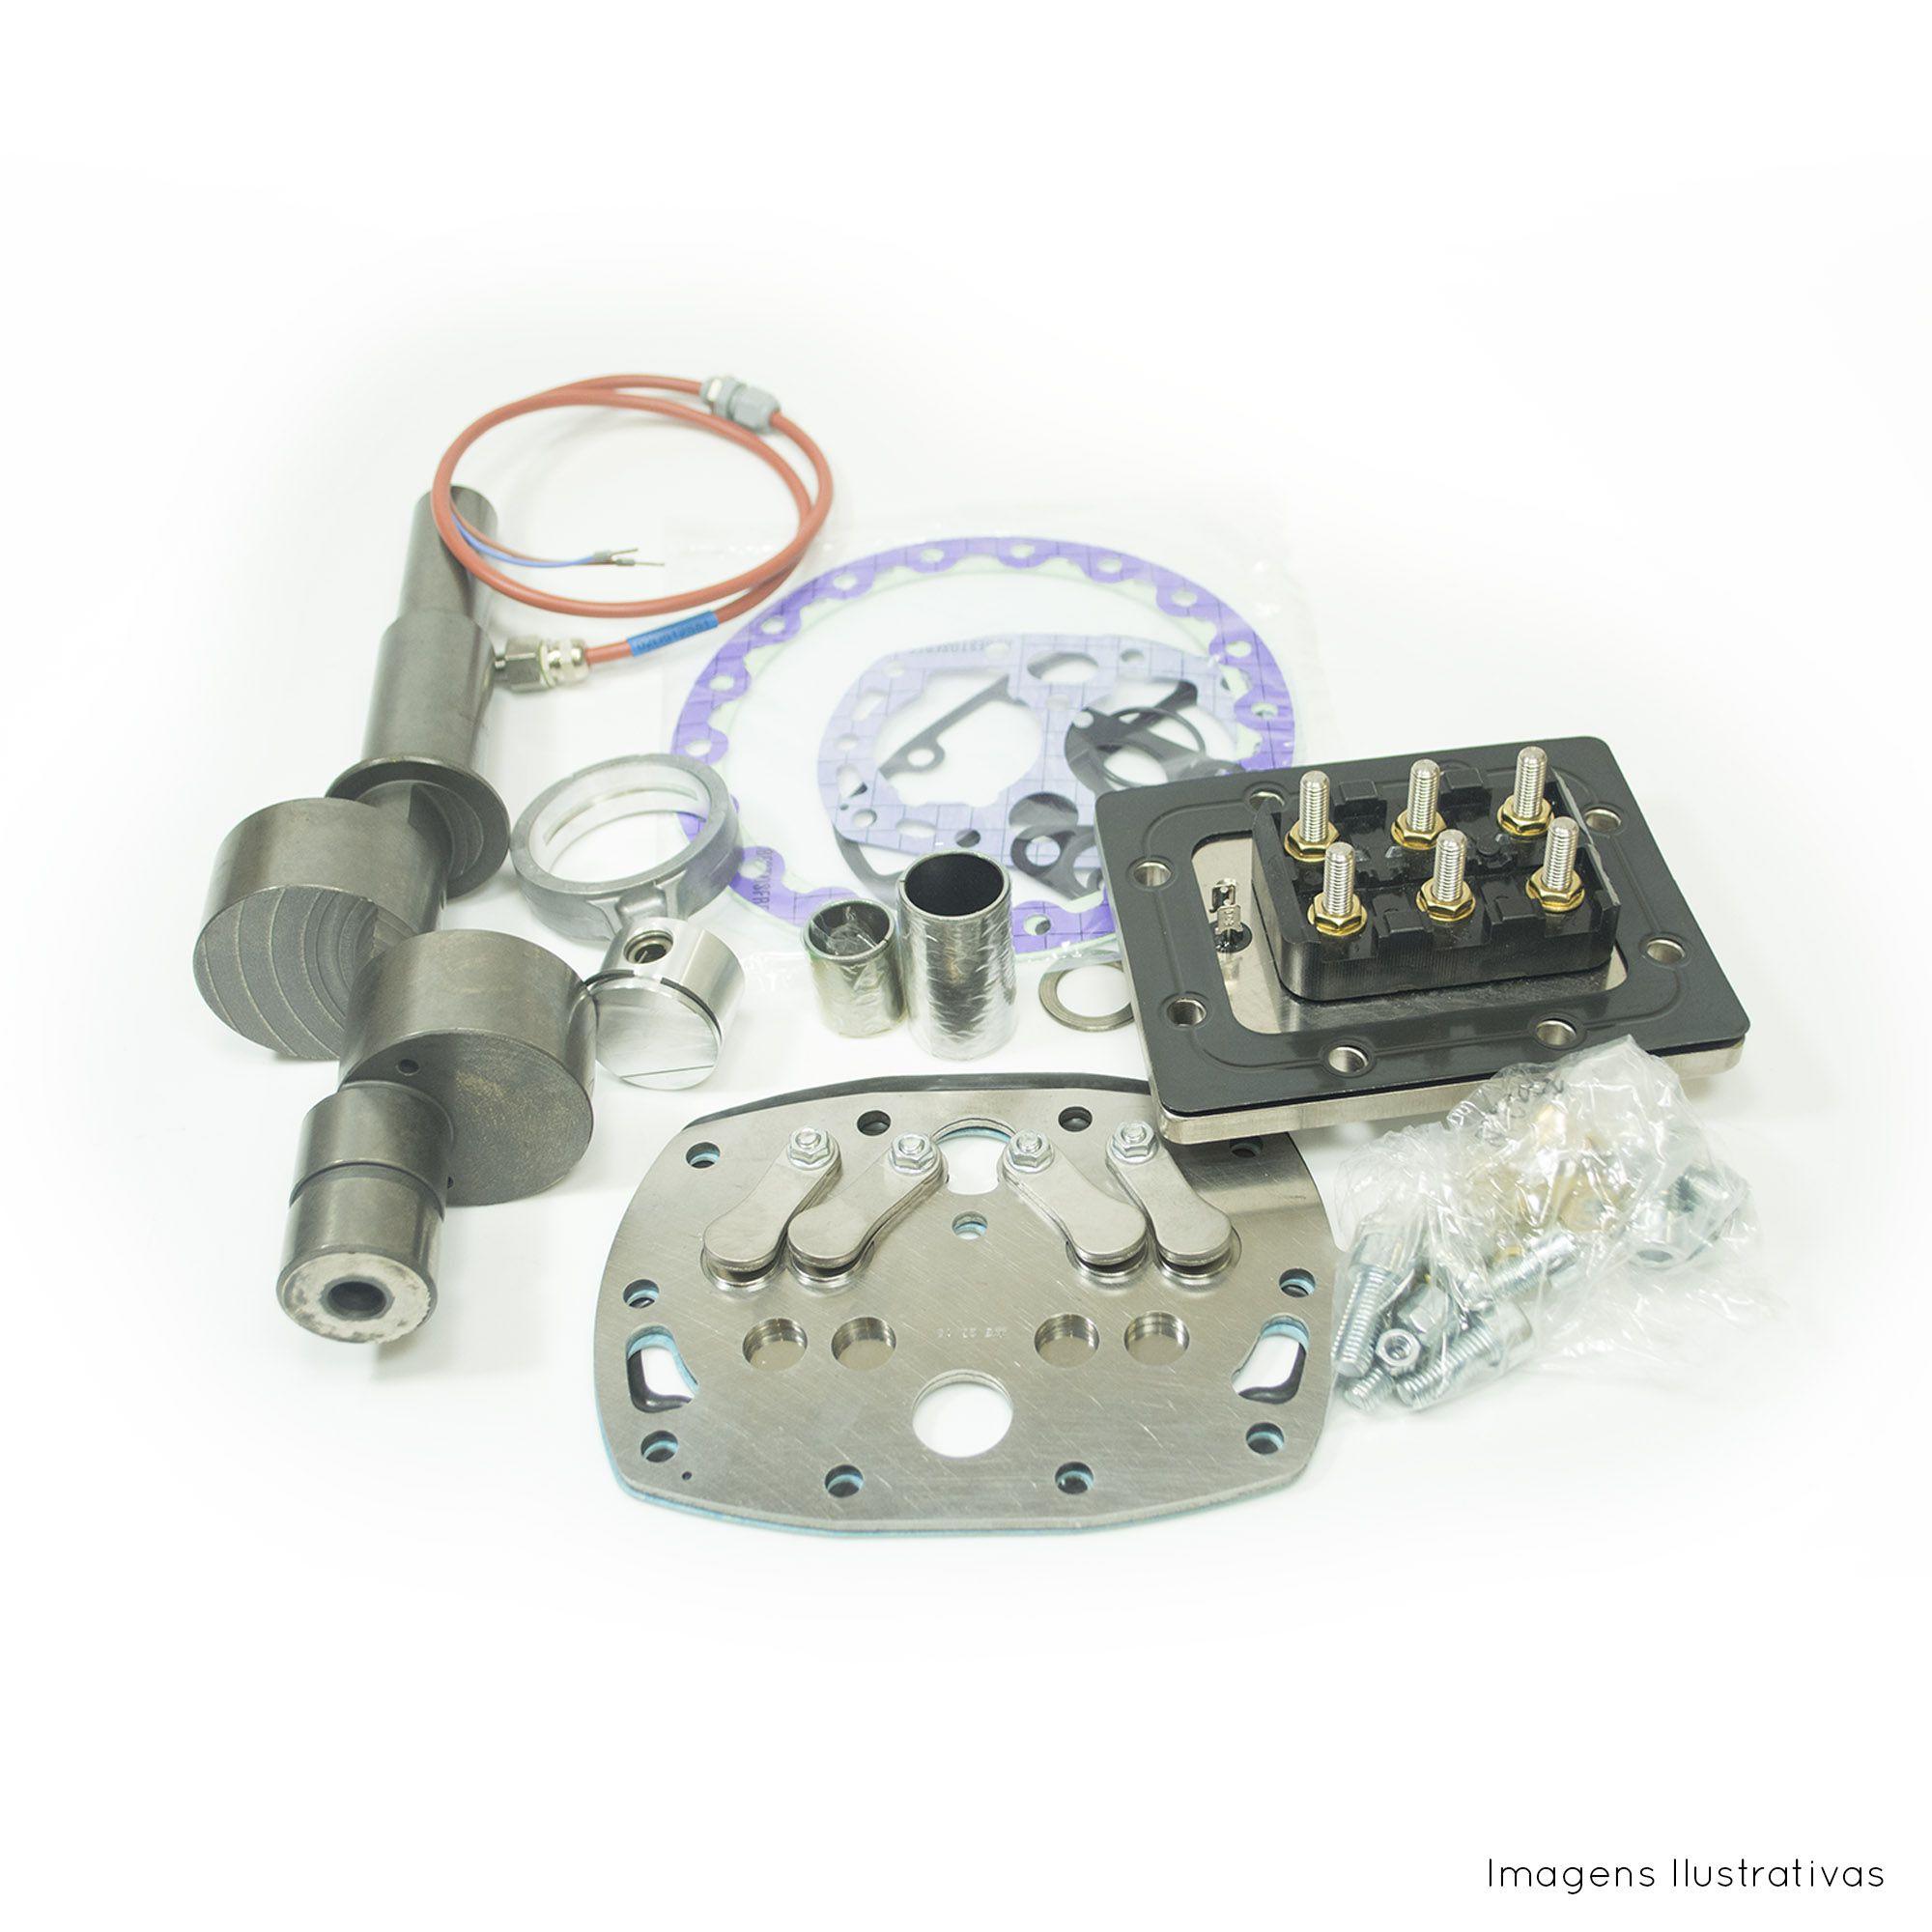 Sensores - 900-10516